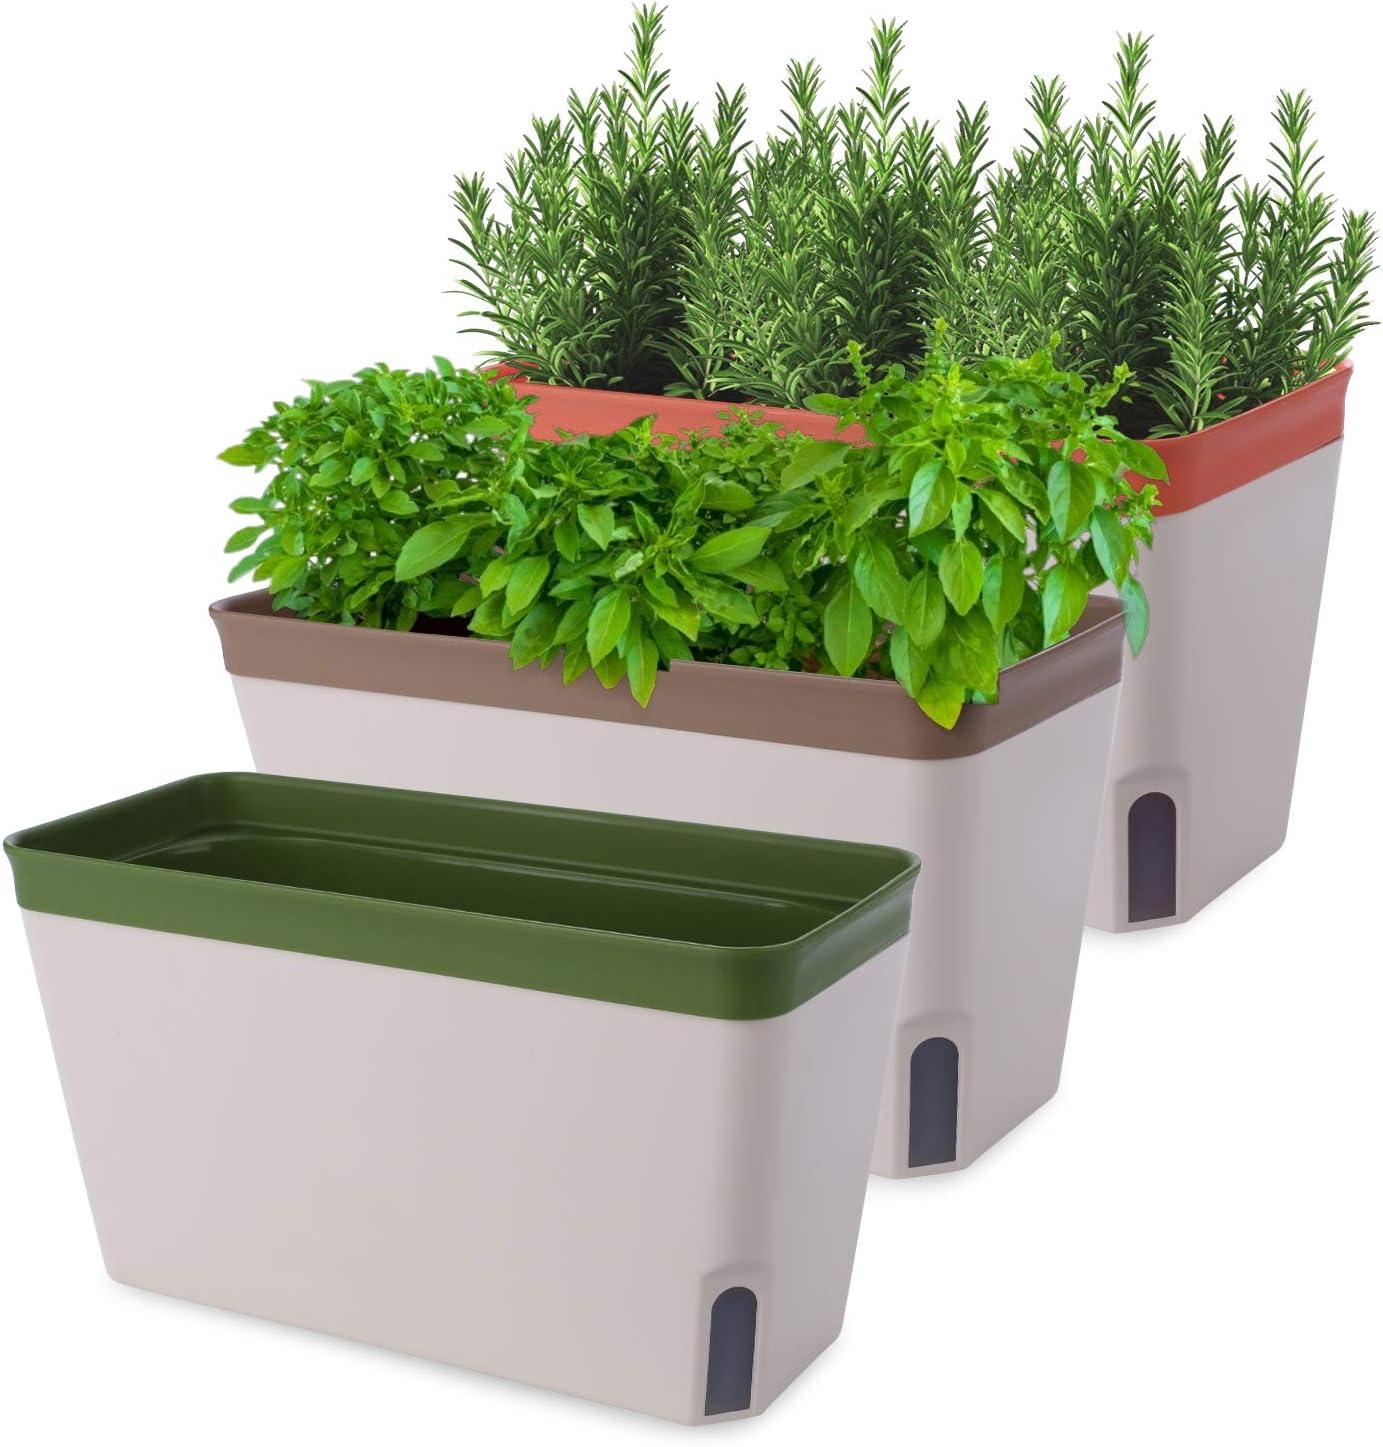 Akarden Windowsill Herb Planter Box, 3 Set Rectangular Self Watering Indoor Garden for Kitchens, Grow Plants, Flowers or Succulents, Large Water Reservoir